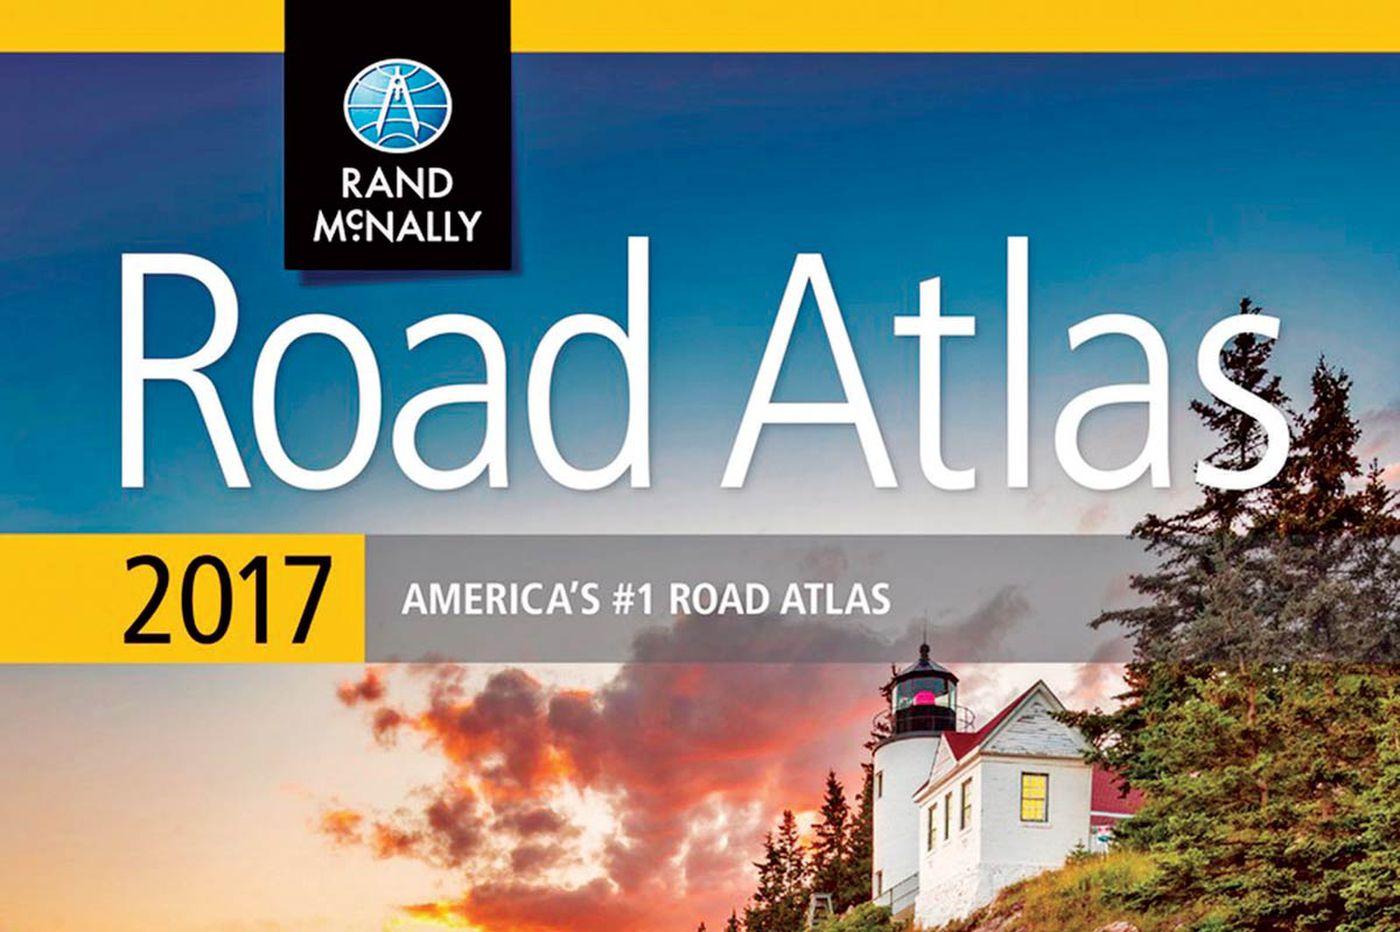 Road atlas still valuable in GPS age